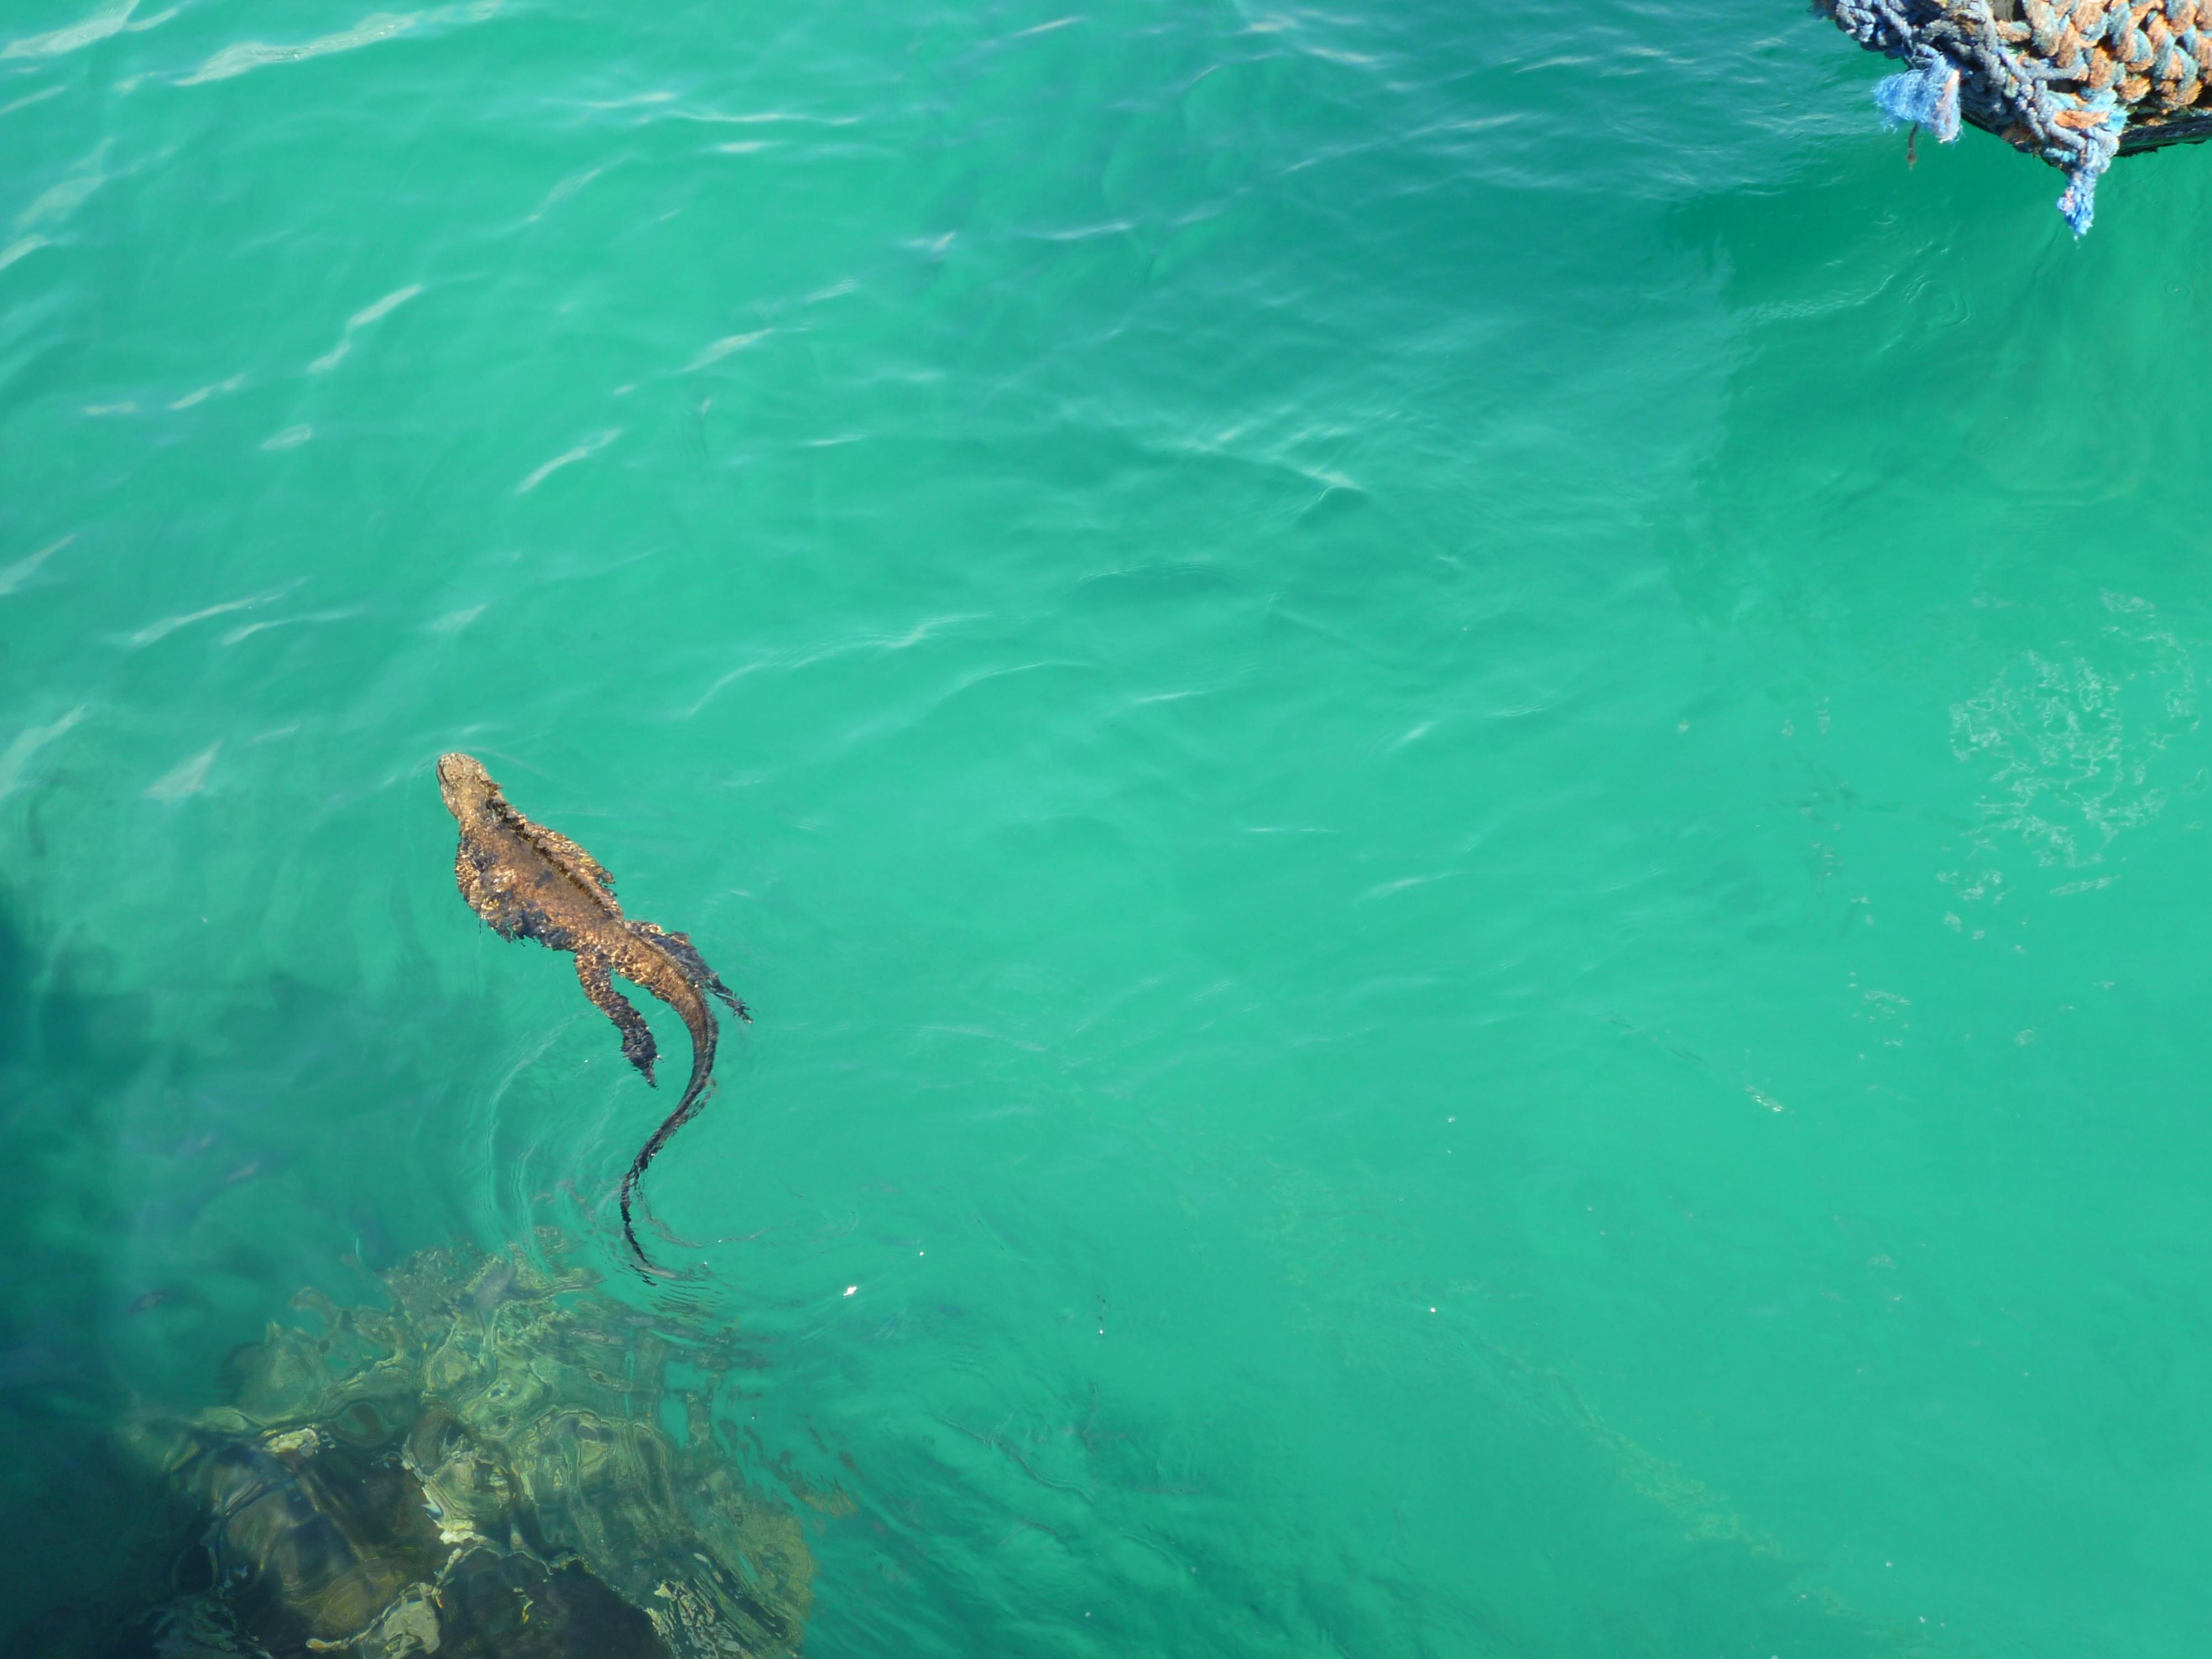 Iguana swimming in blue-green water